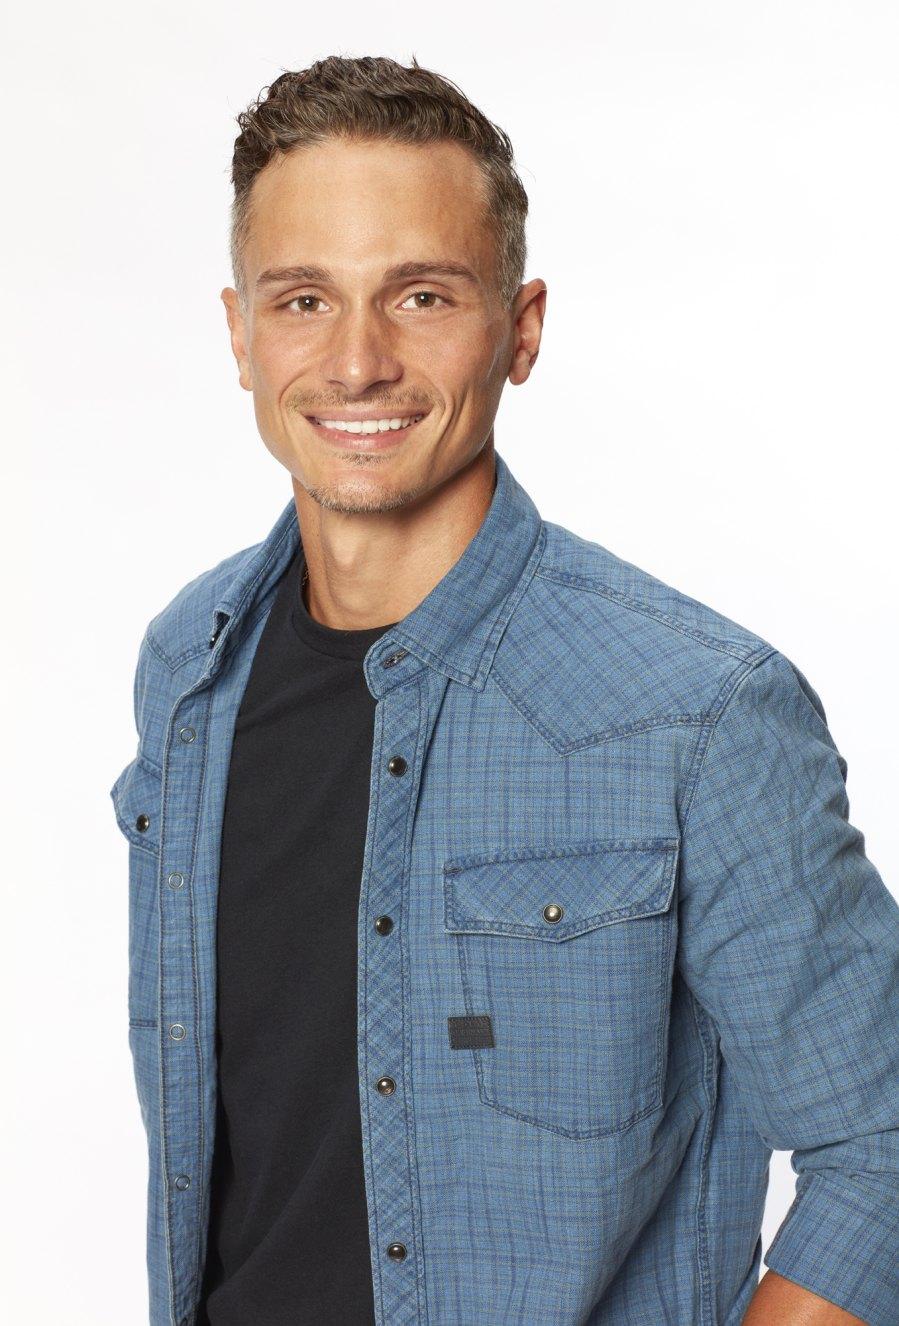 Tyler S. The Wildest Revelations From Bachelorette Season 16 Bios